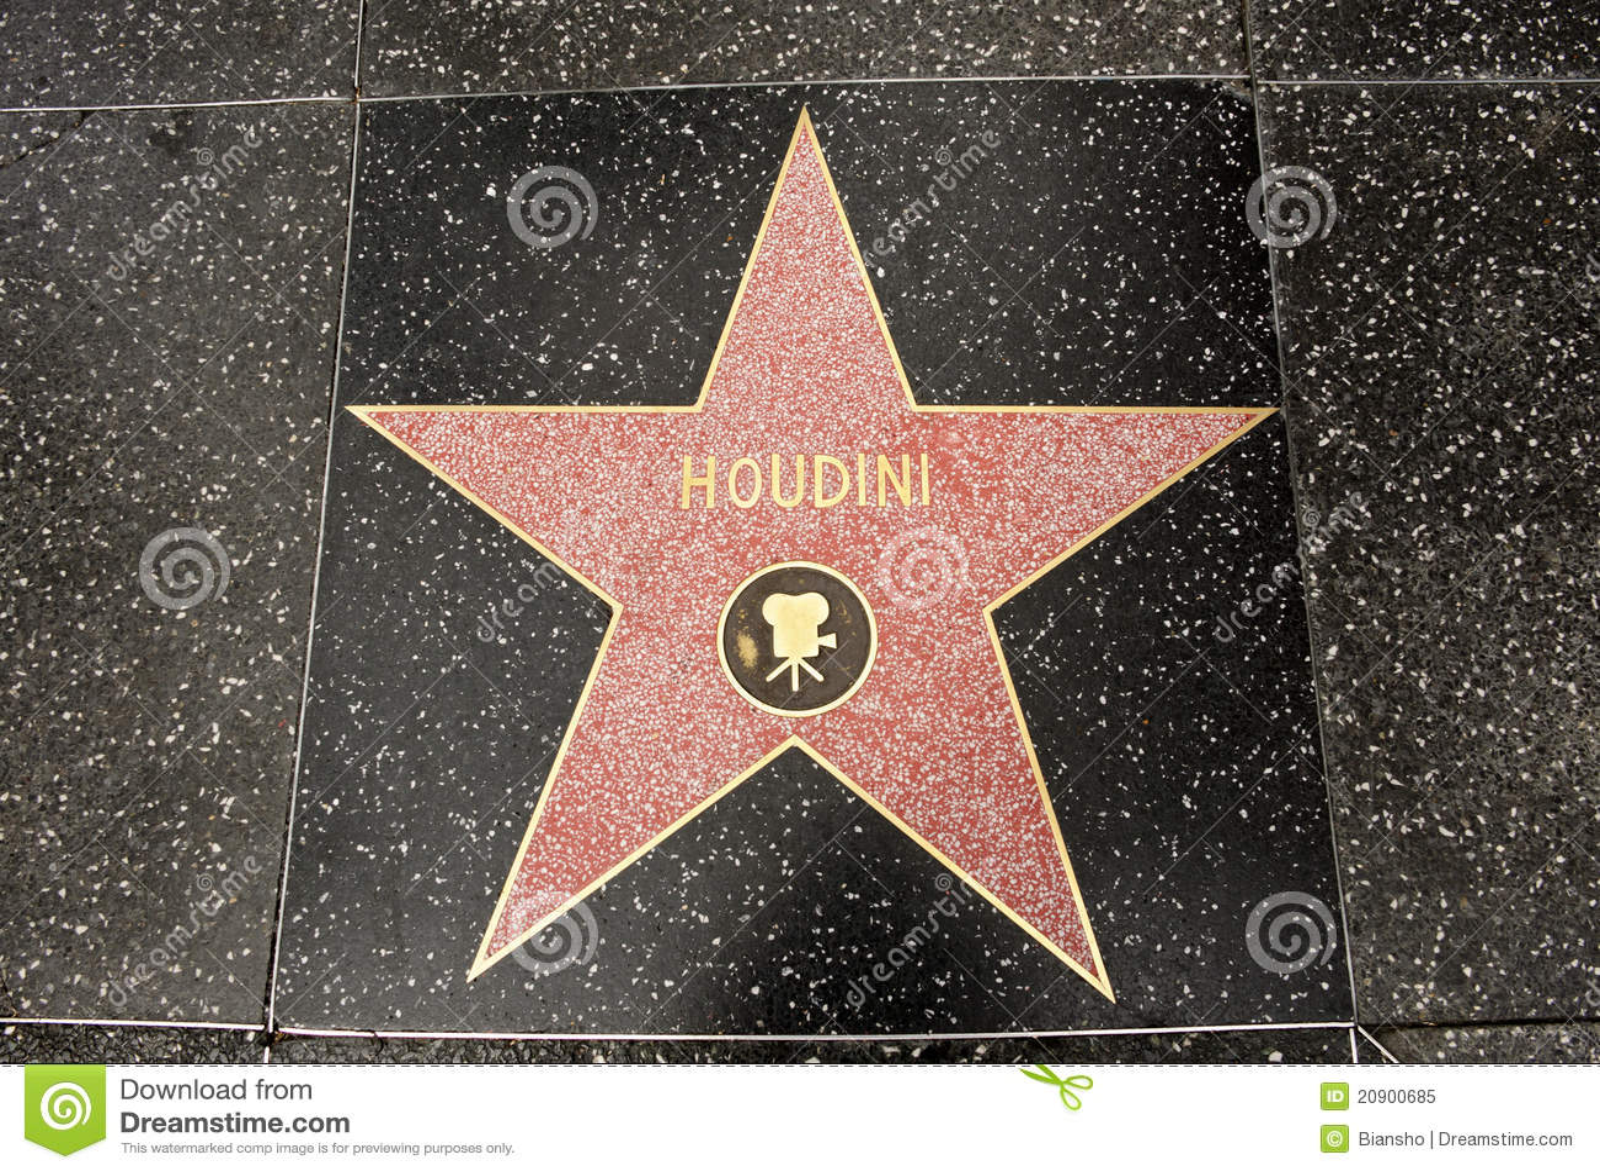 The star of Harry Houdini